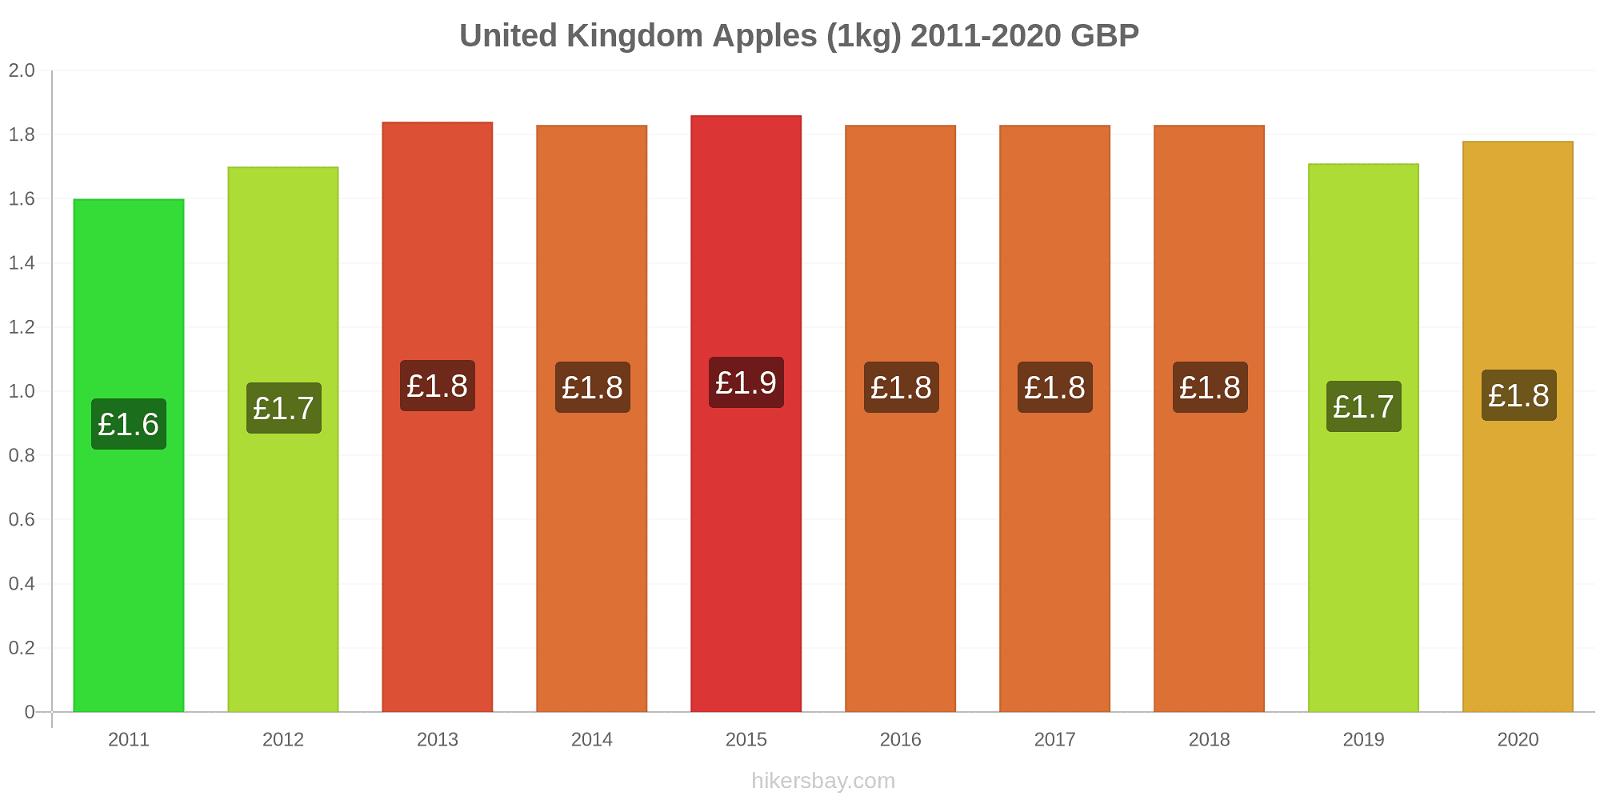 United Kingdom price changes Apples (1kg) hikersbay.com